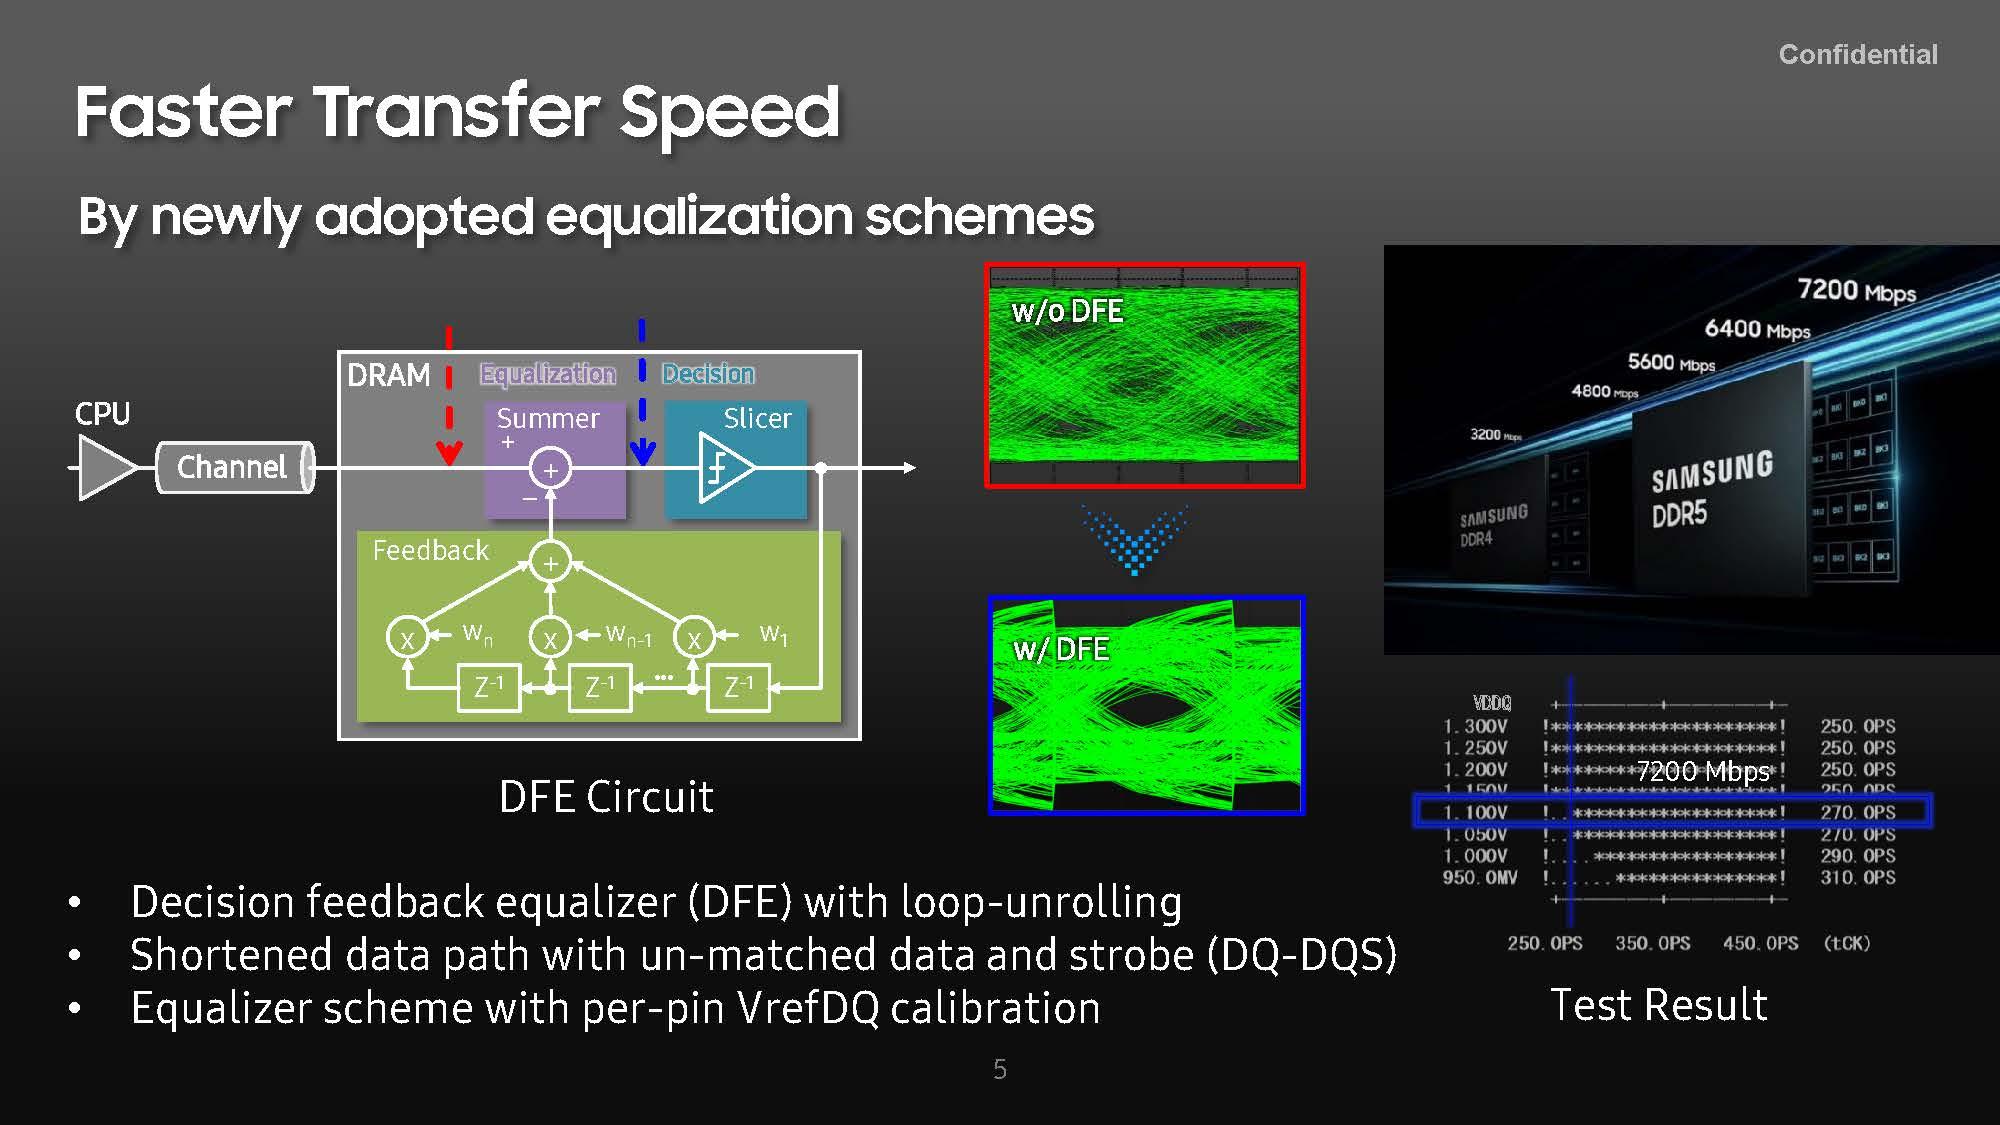 HC33 Samsung DDR5 Higher Transfer Speed